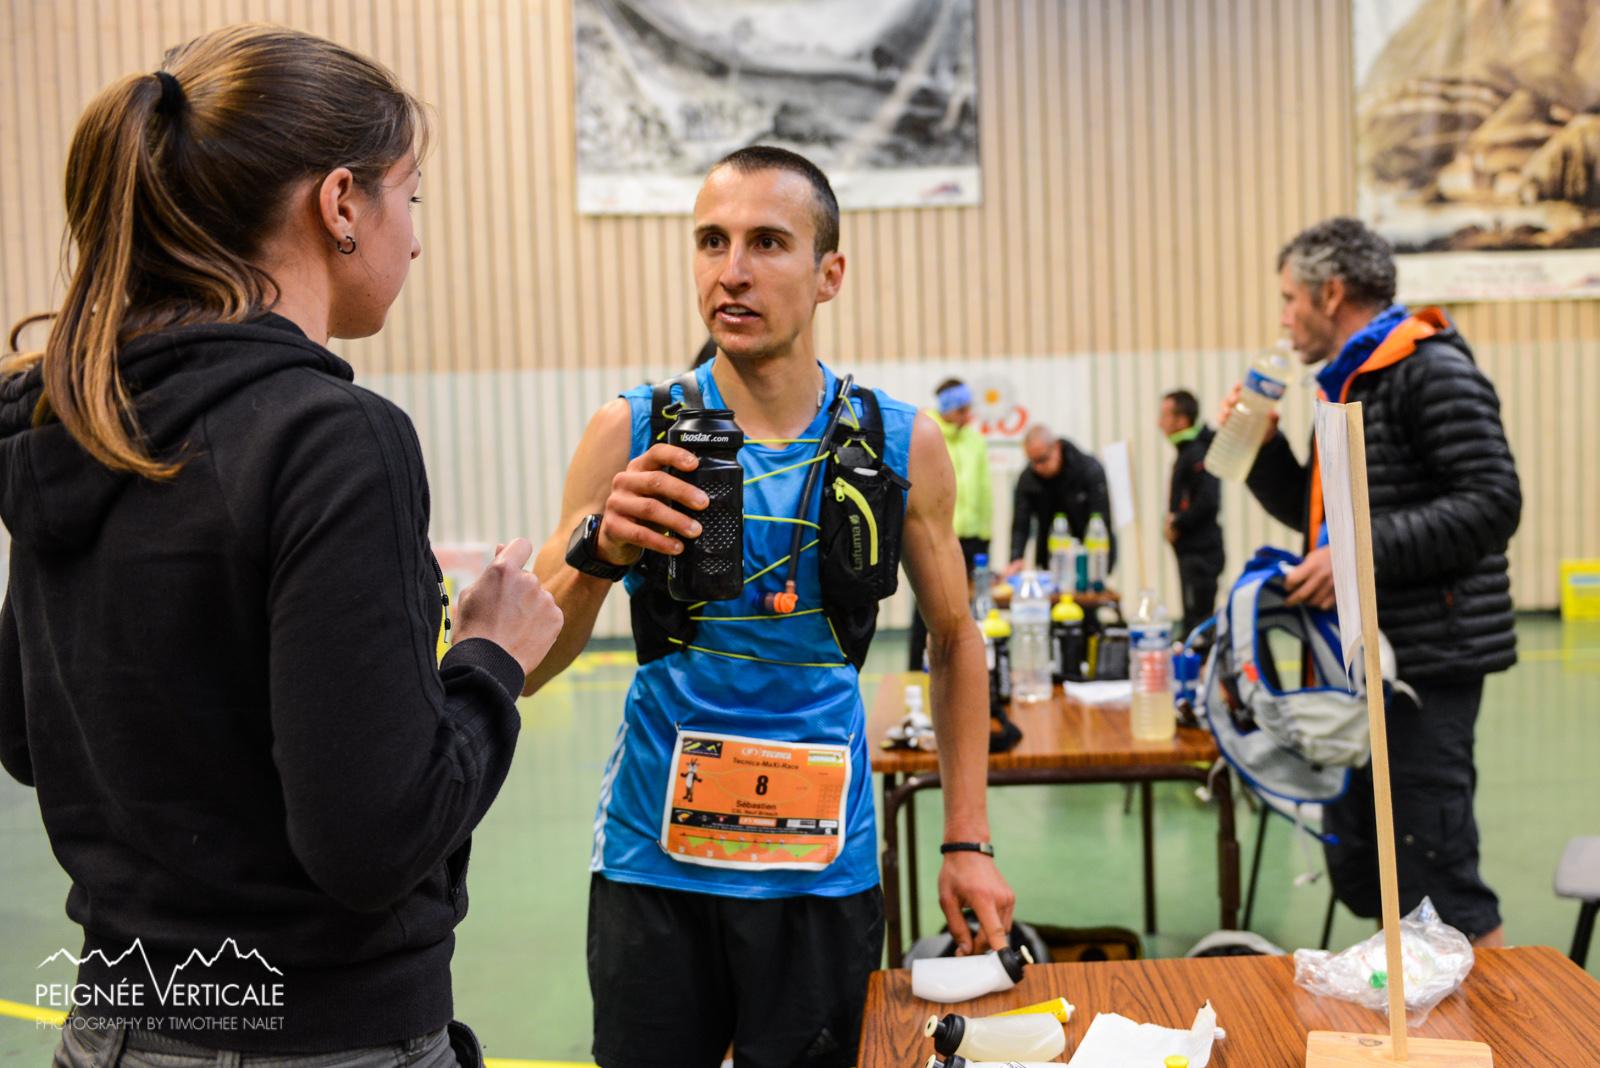 MaxiRace-Annecy-2014-Team-Hoka-Timothee-Nalet-0889.jpg